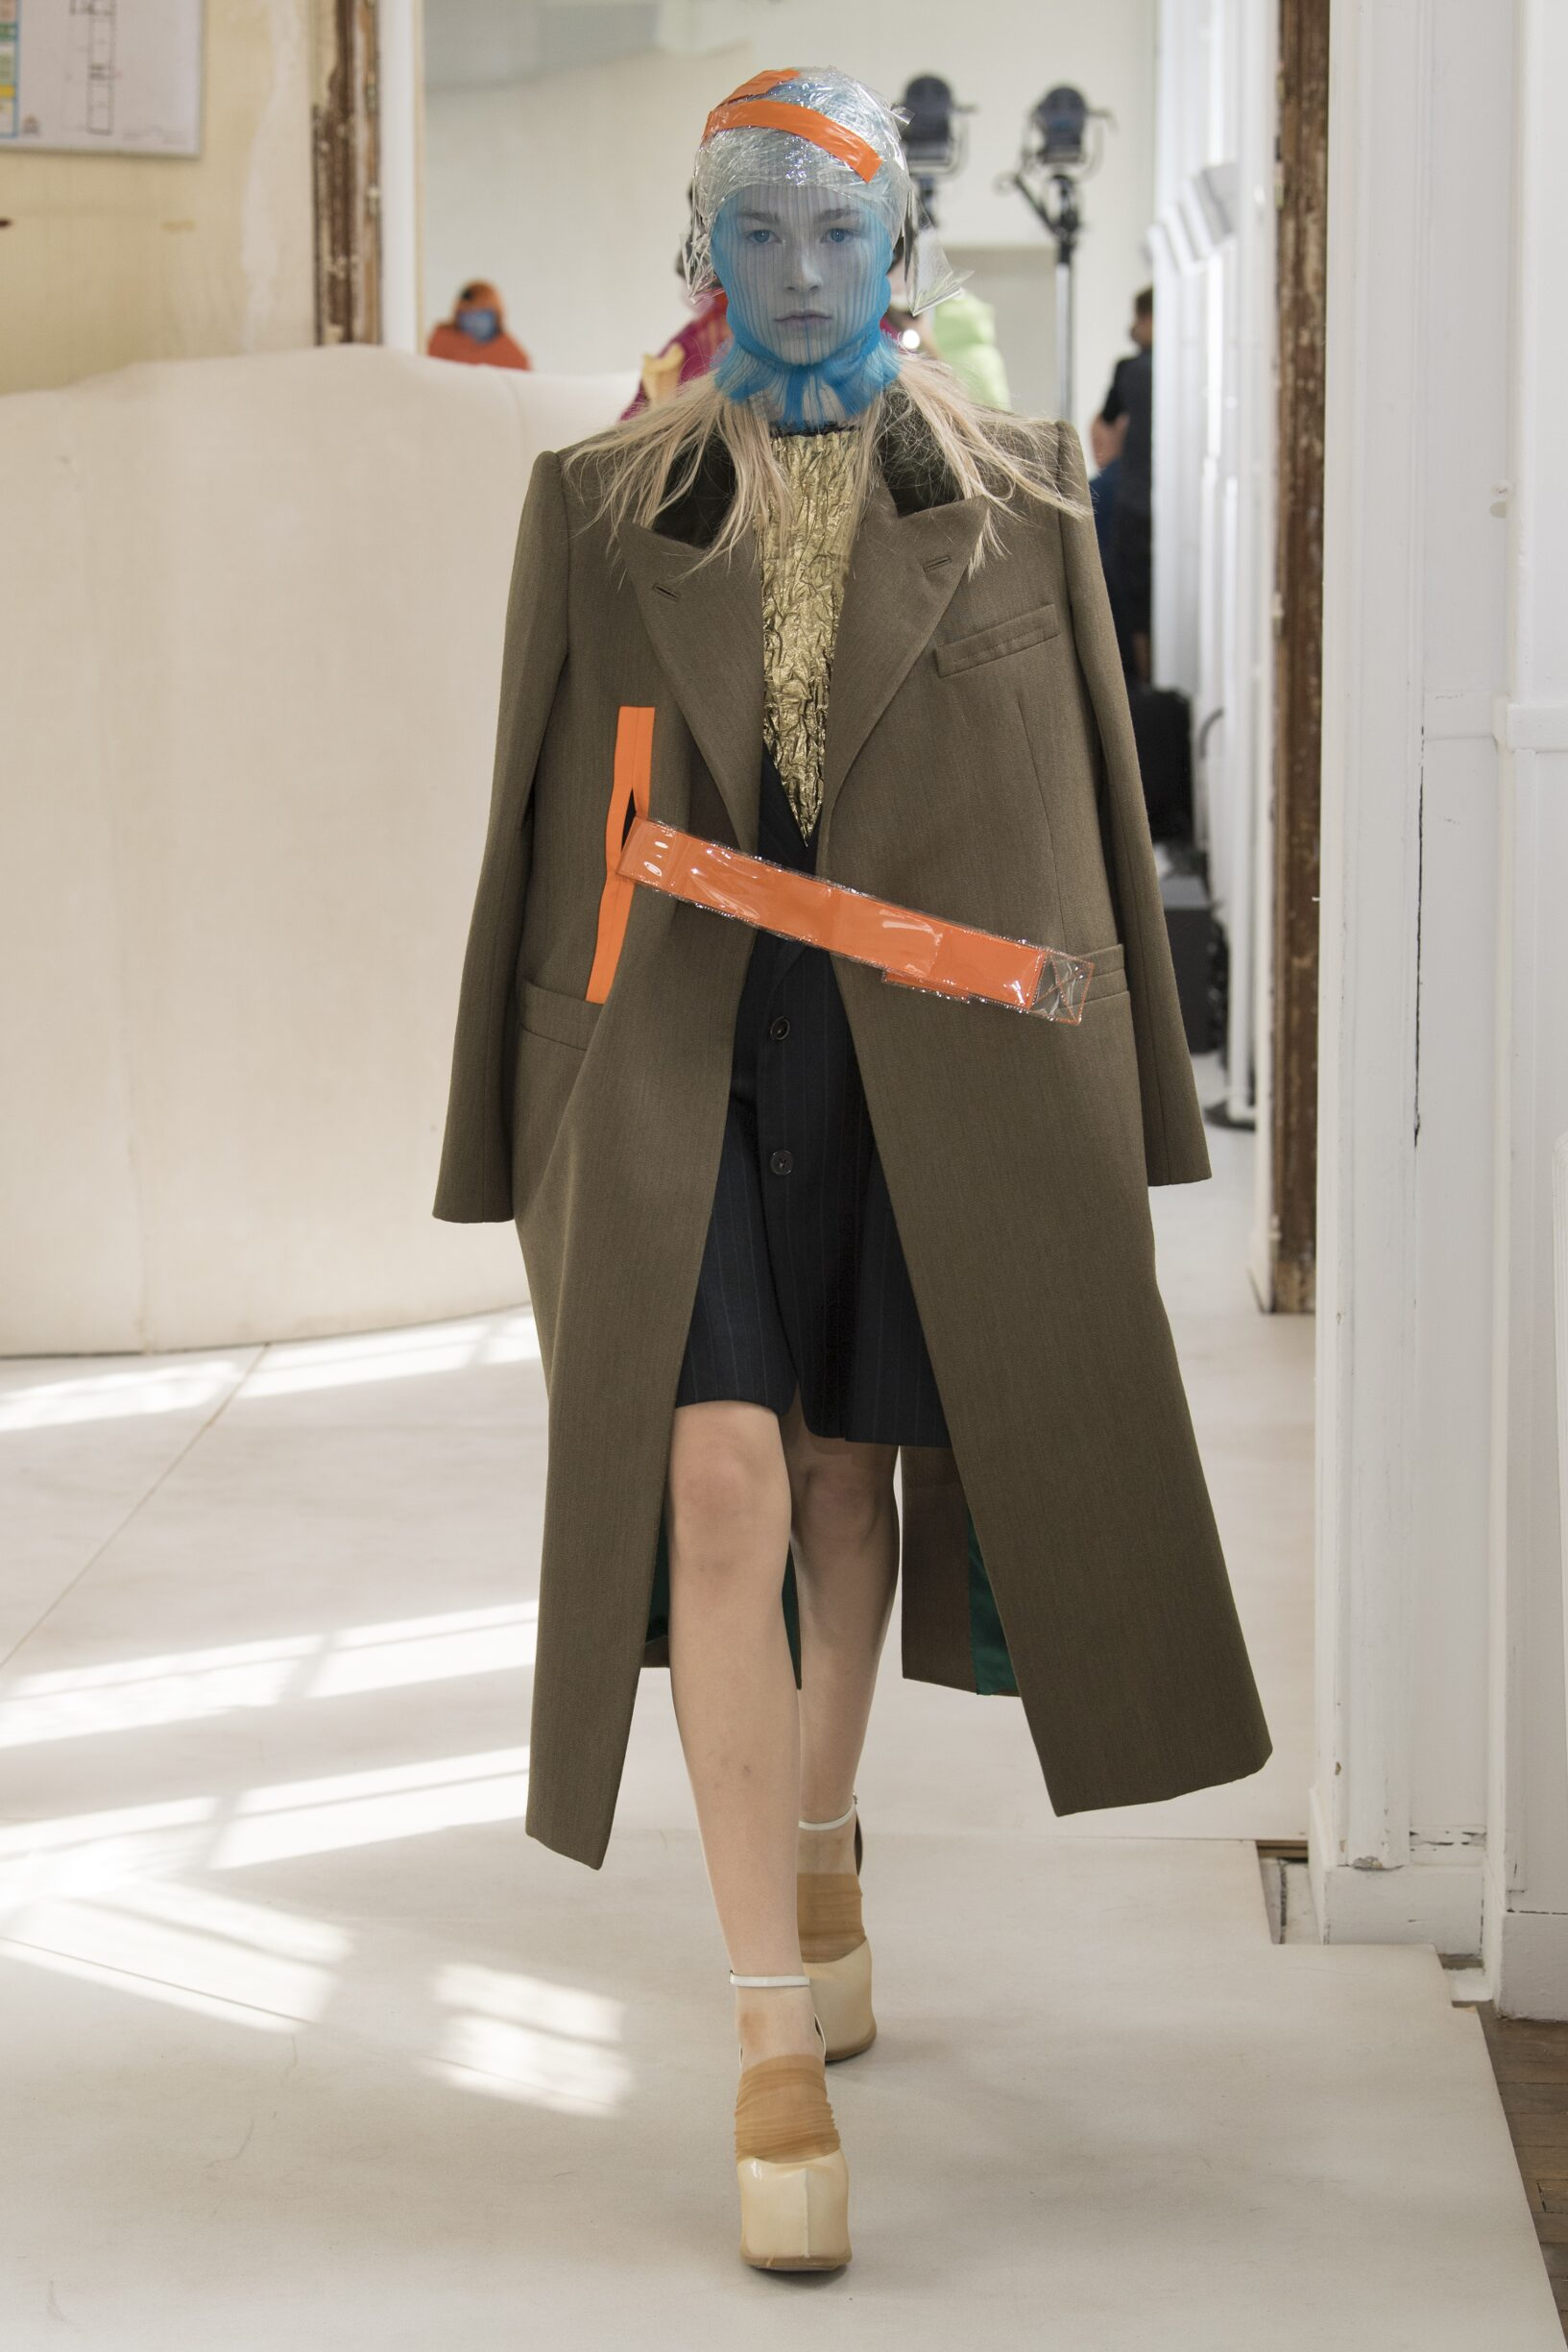 Maison Margiela Artisanal Fall Winter 2018 Womens Collection Paris Fashion Week